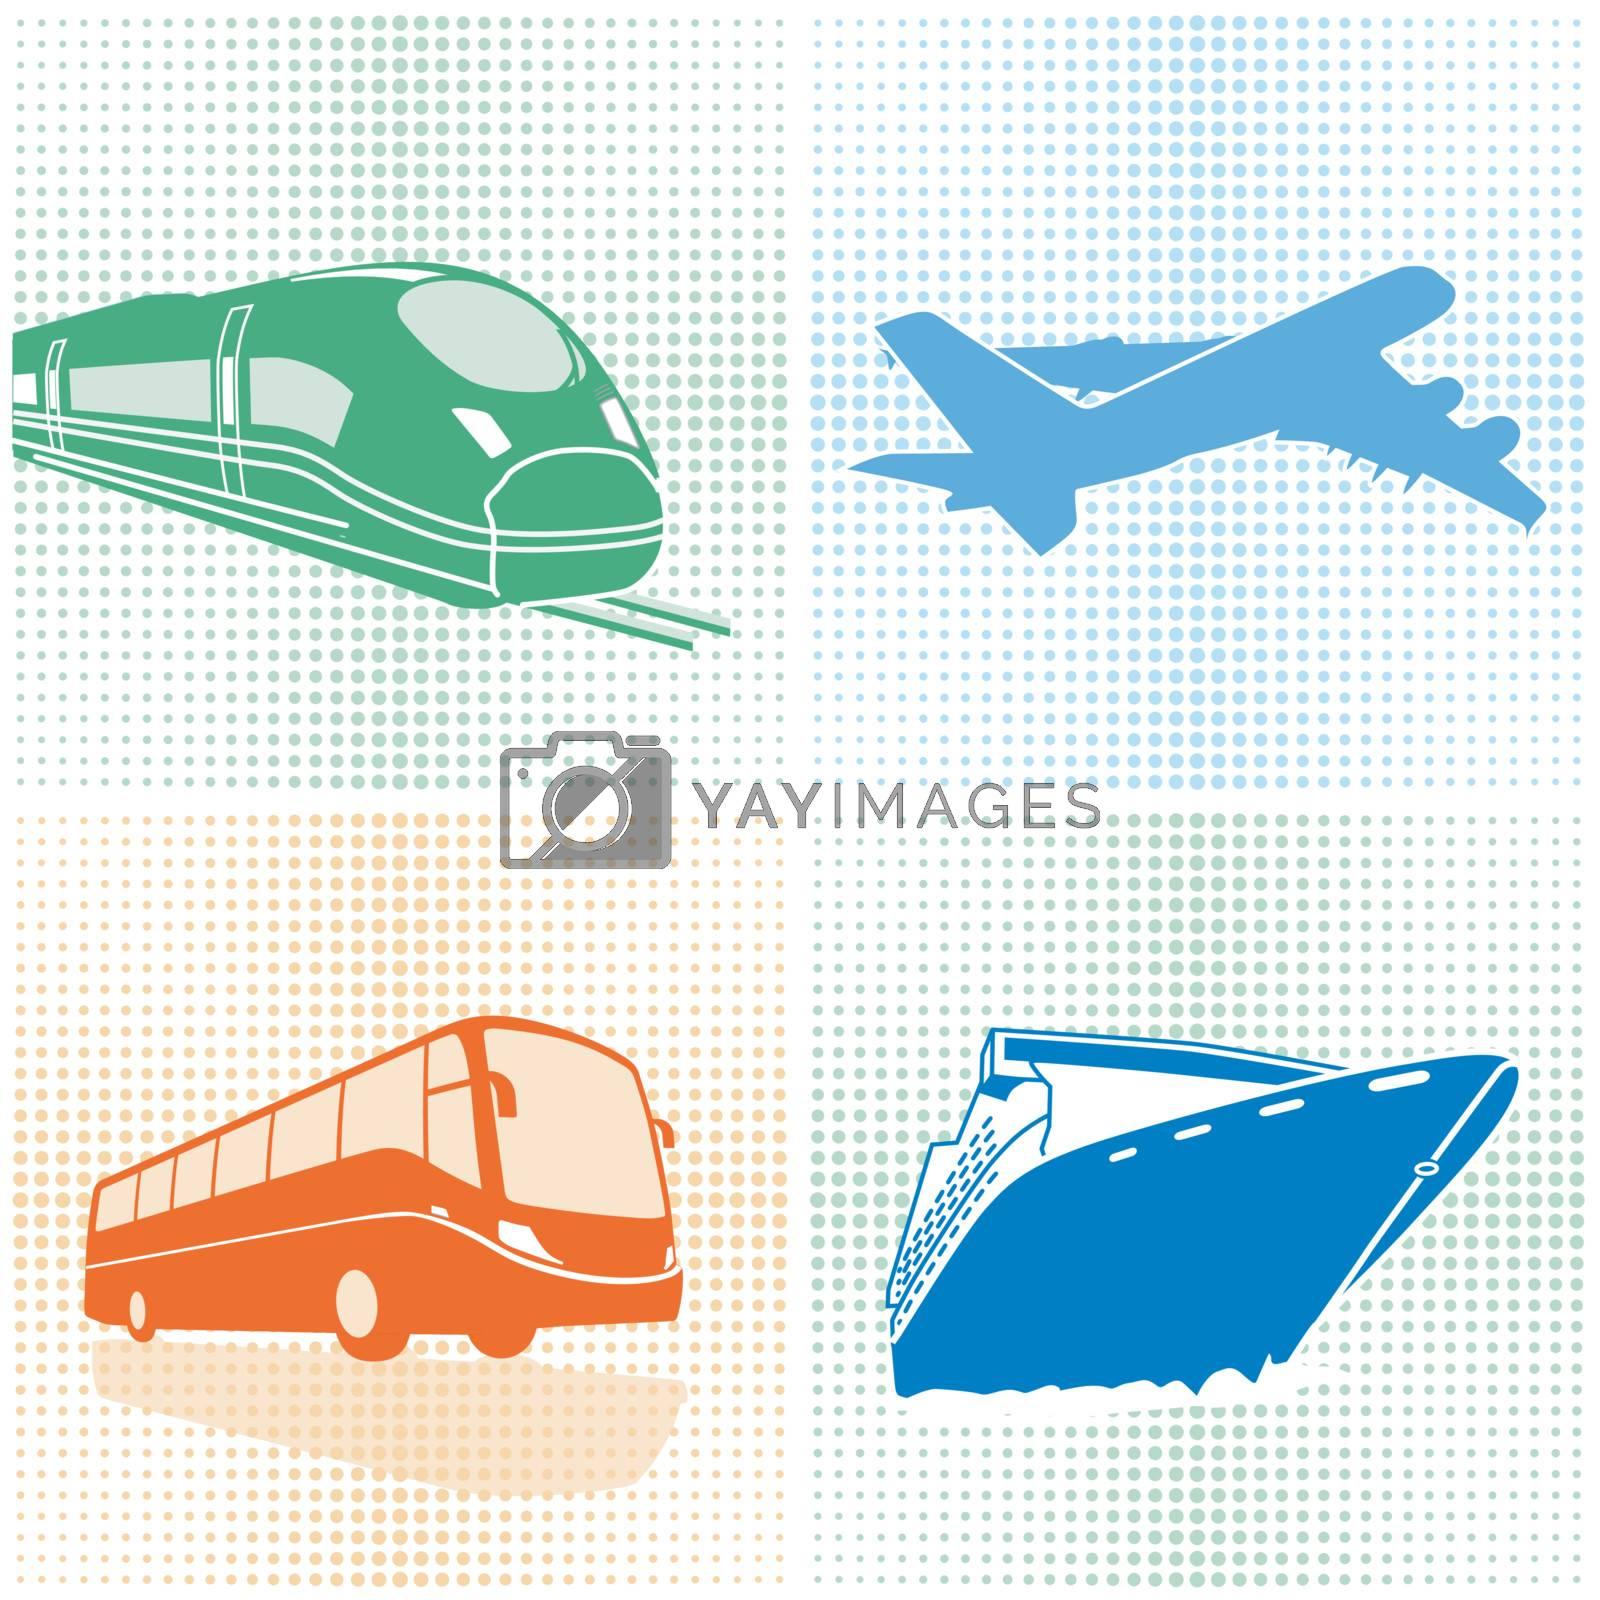 Airplane, bus, train, ship, transport